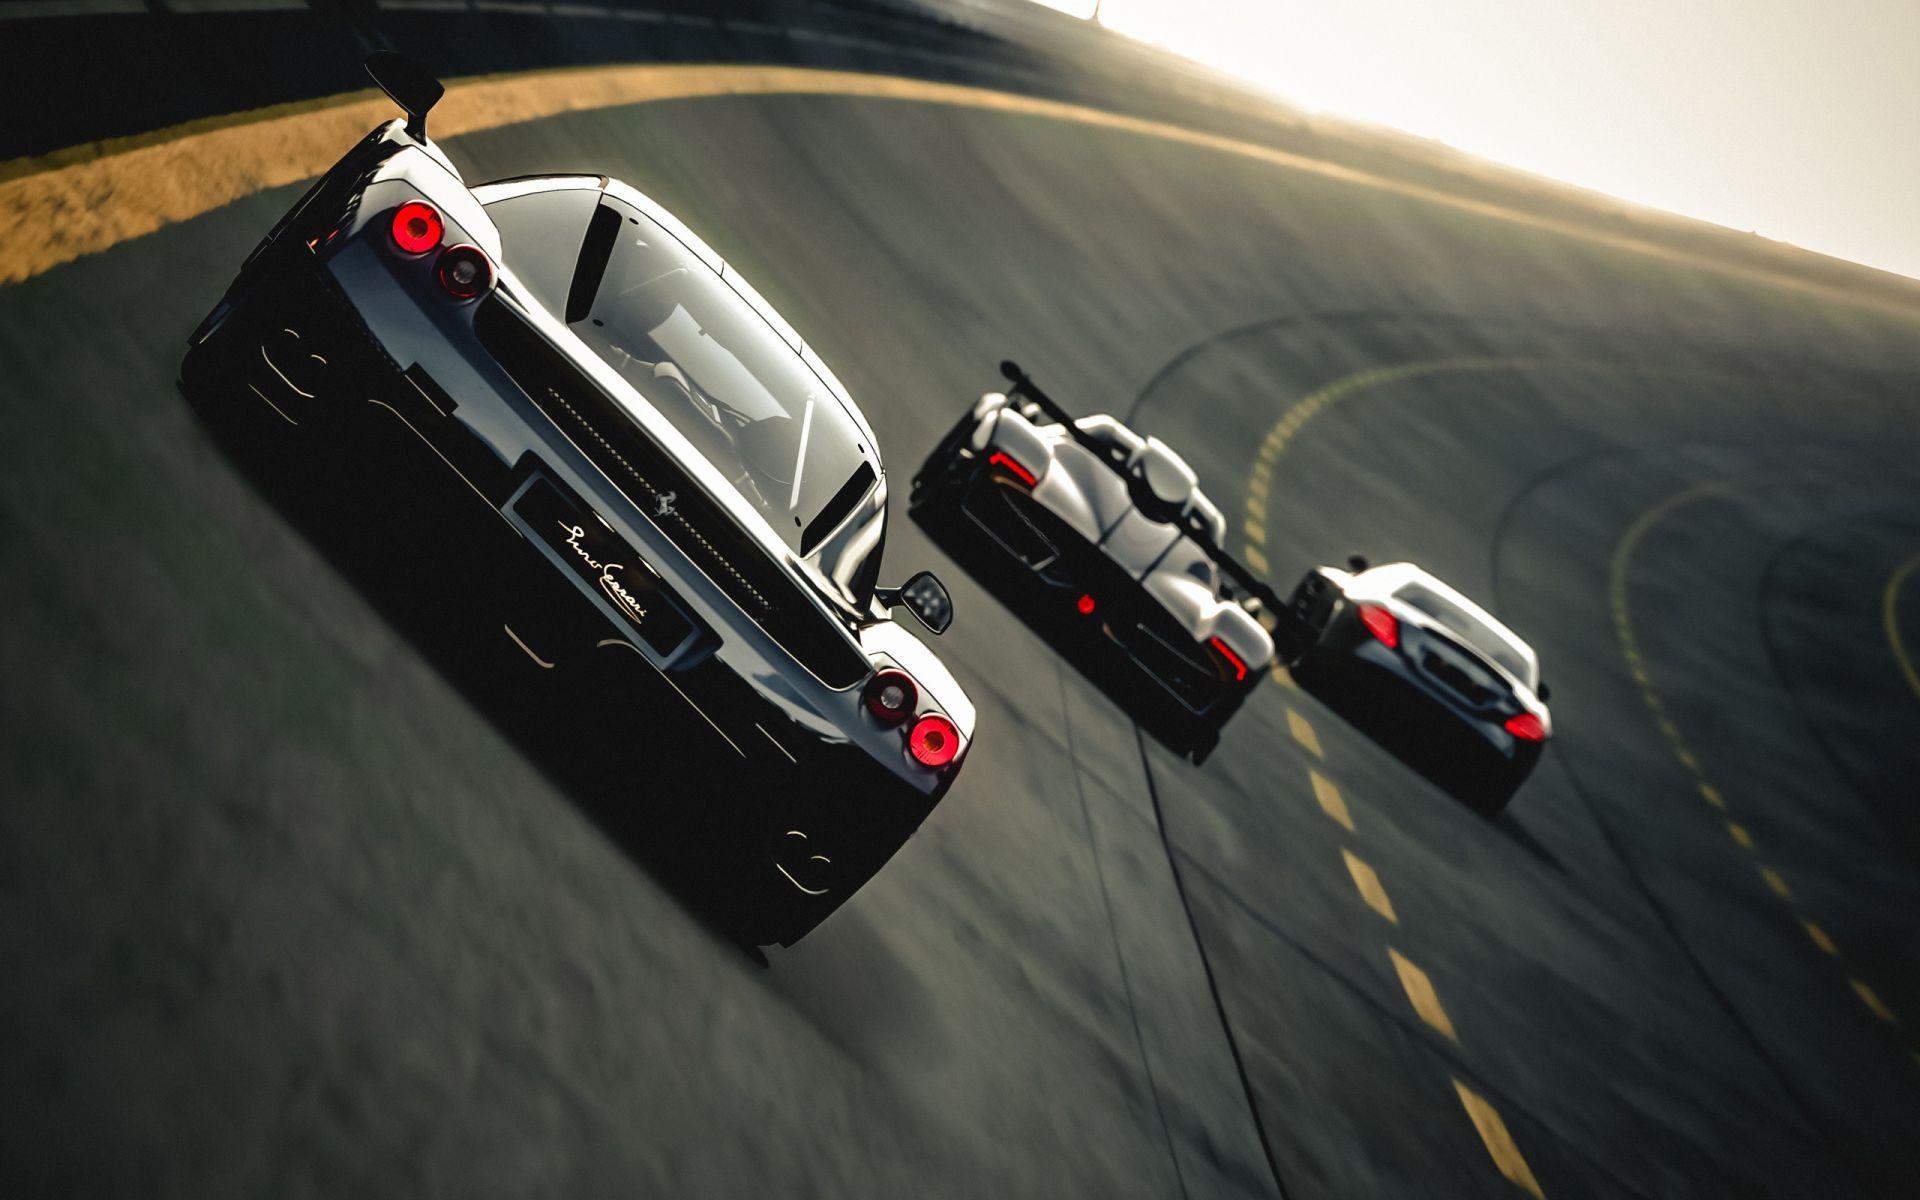 Supercar Collection Wallpaper Supercars Racing hd Wallpaper 1920x1200